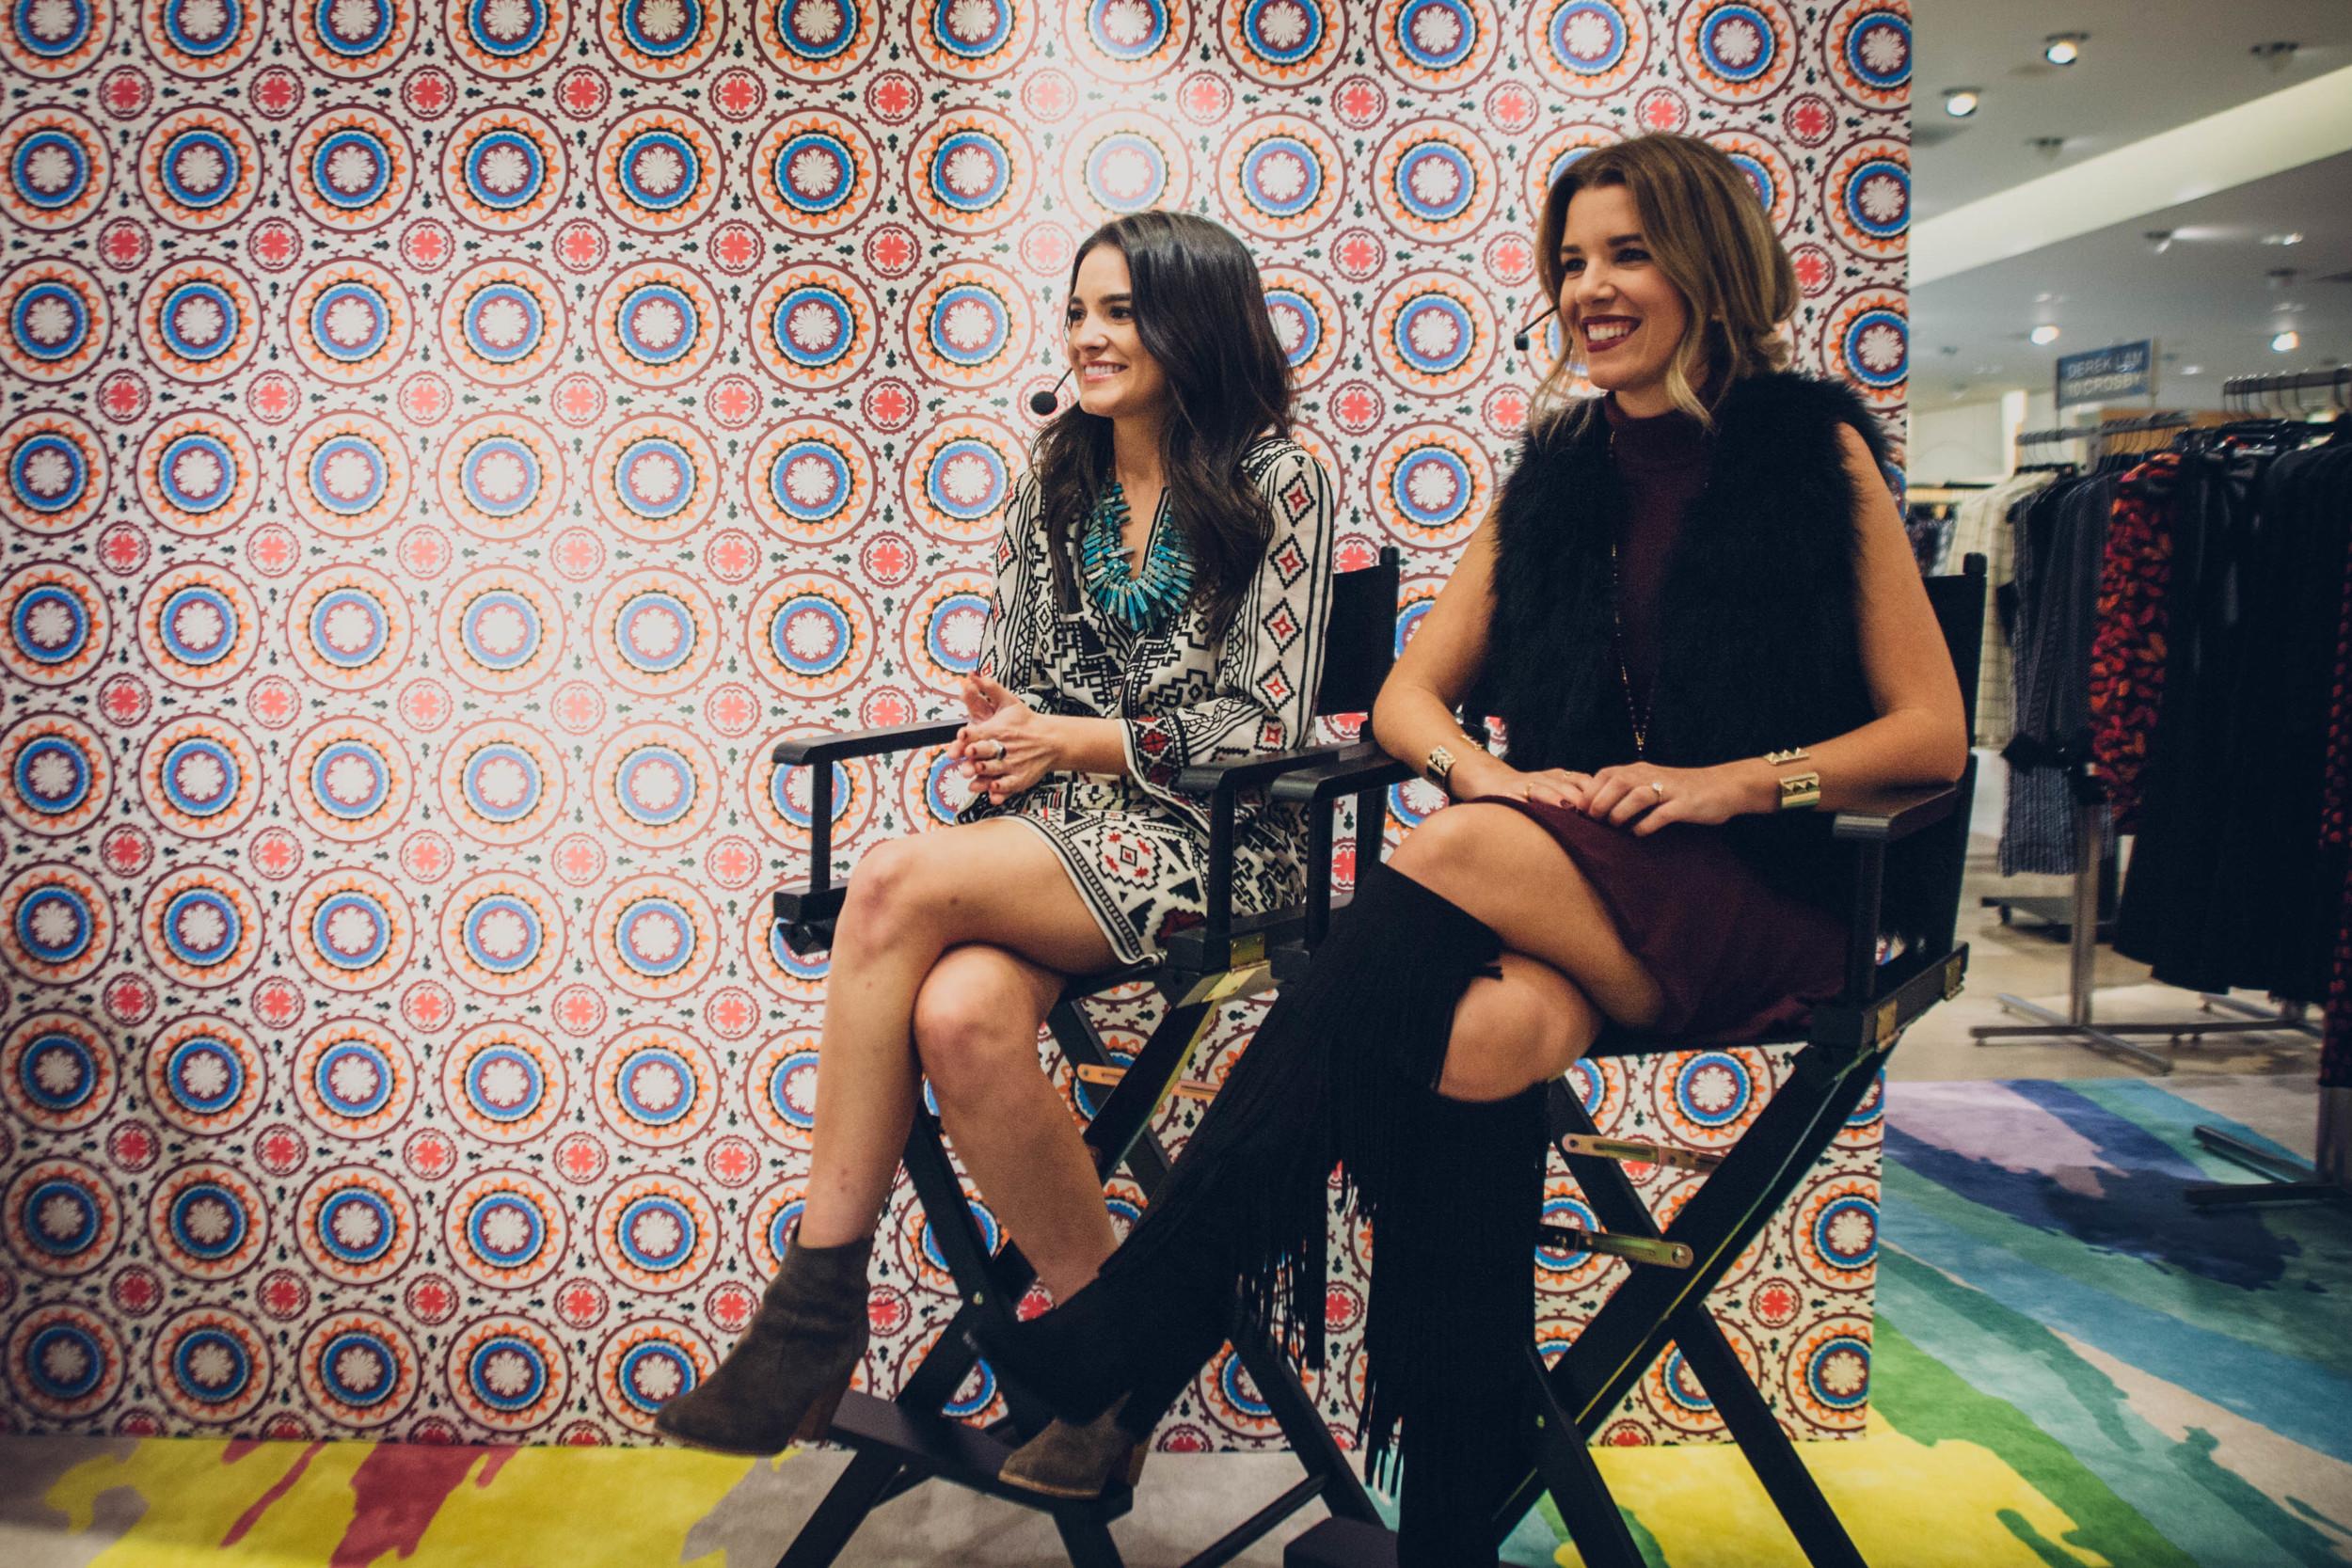 Fashion panelists Jourdan Fuentes & Lo Roberts